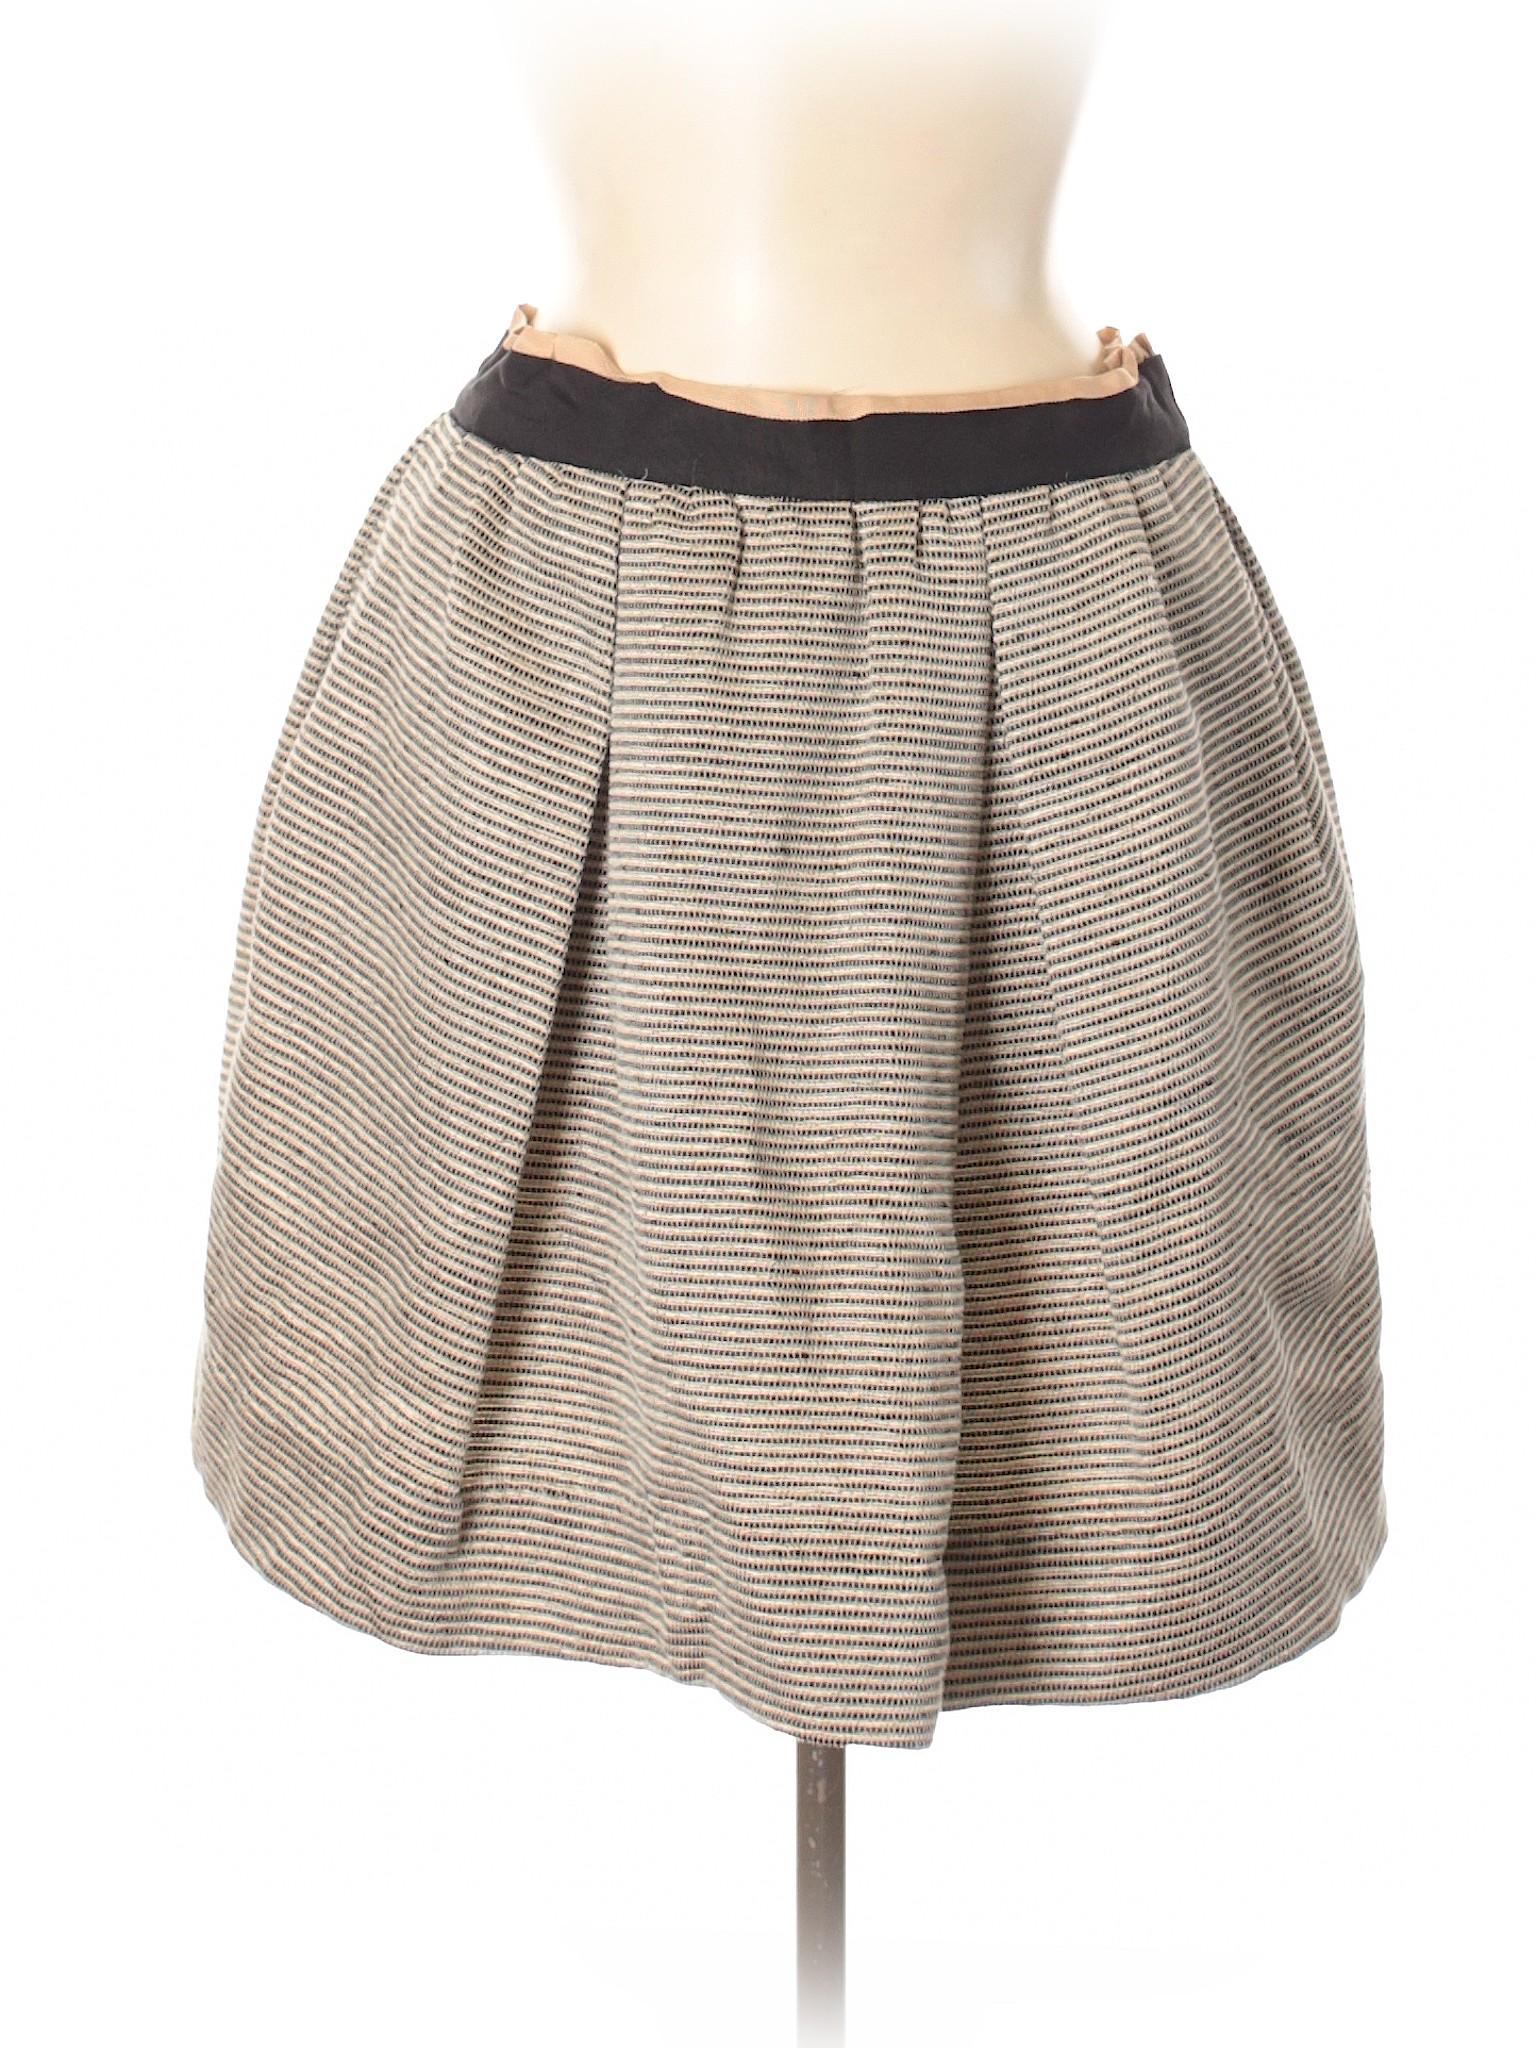 Casual Skirt Boutique Casual Boutique Boutique Skirt zqpI1n